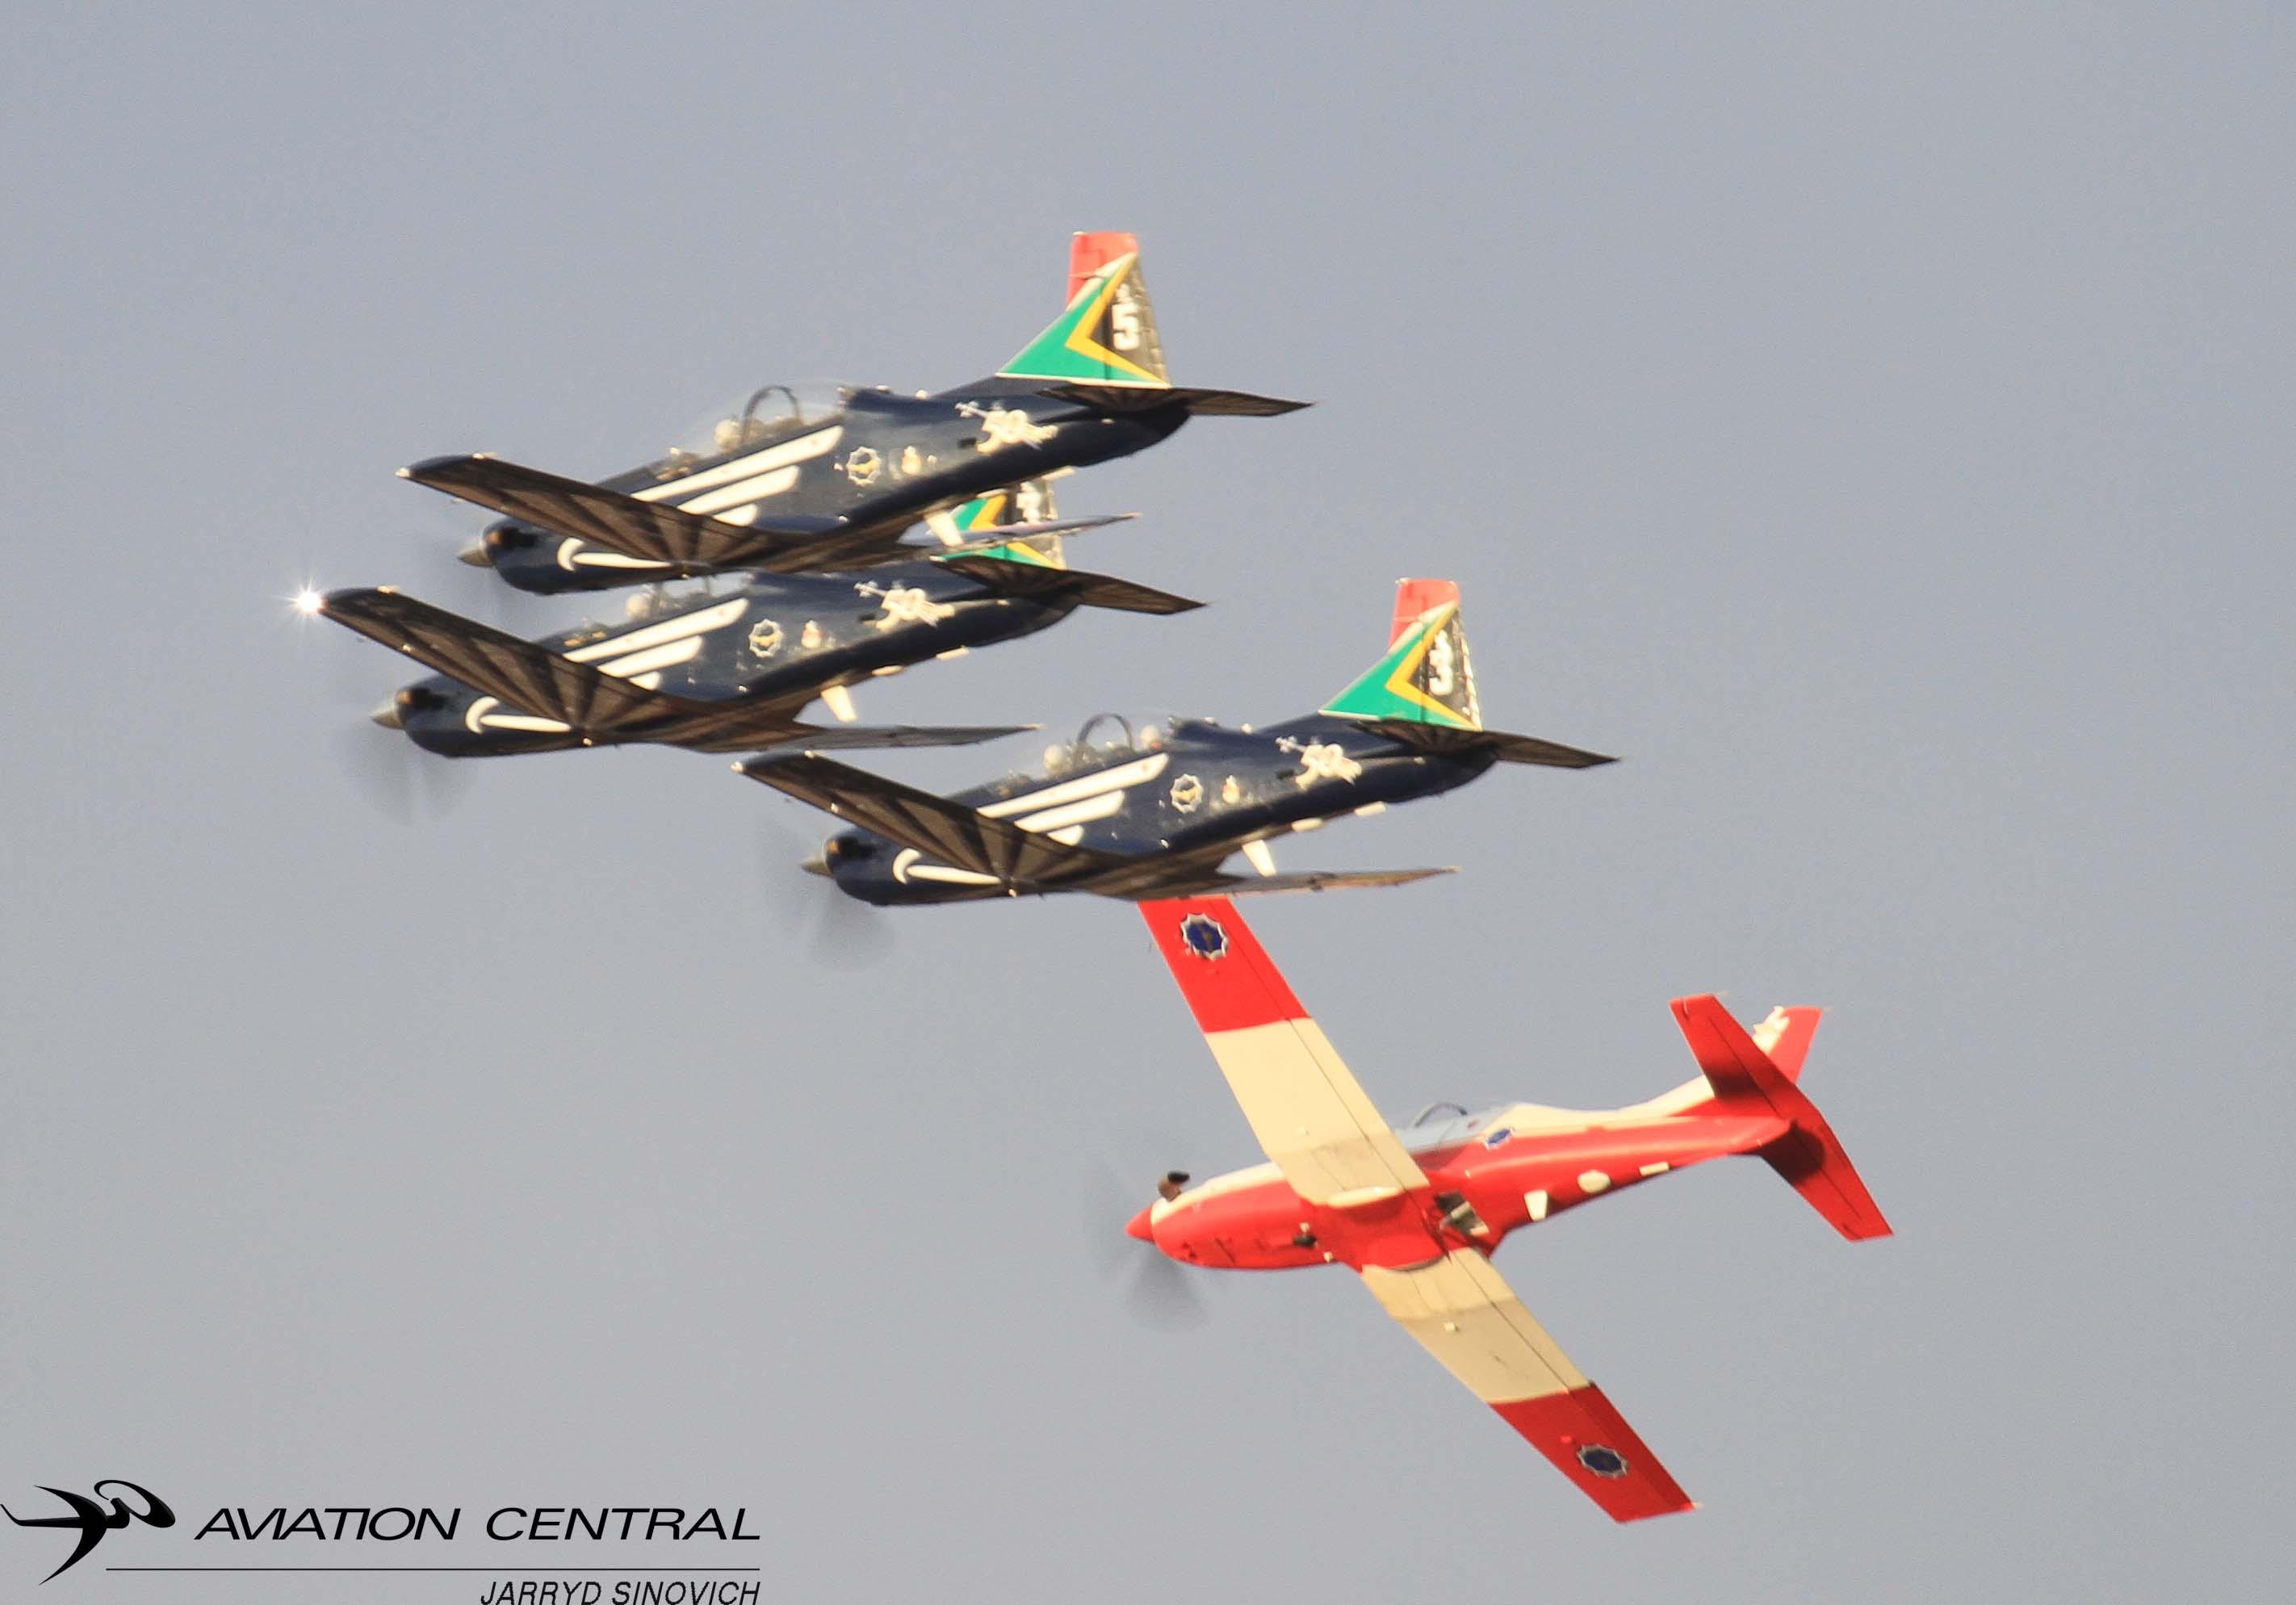 AFB Swartkop to host Prestige Day 01 February - Aviation Central e311cf1e1d84